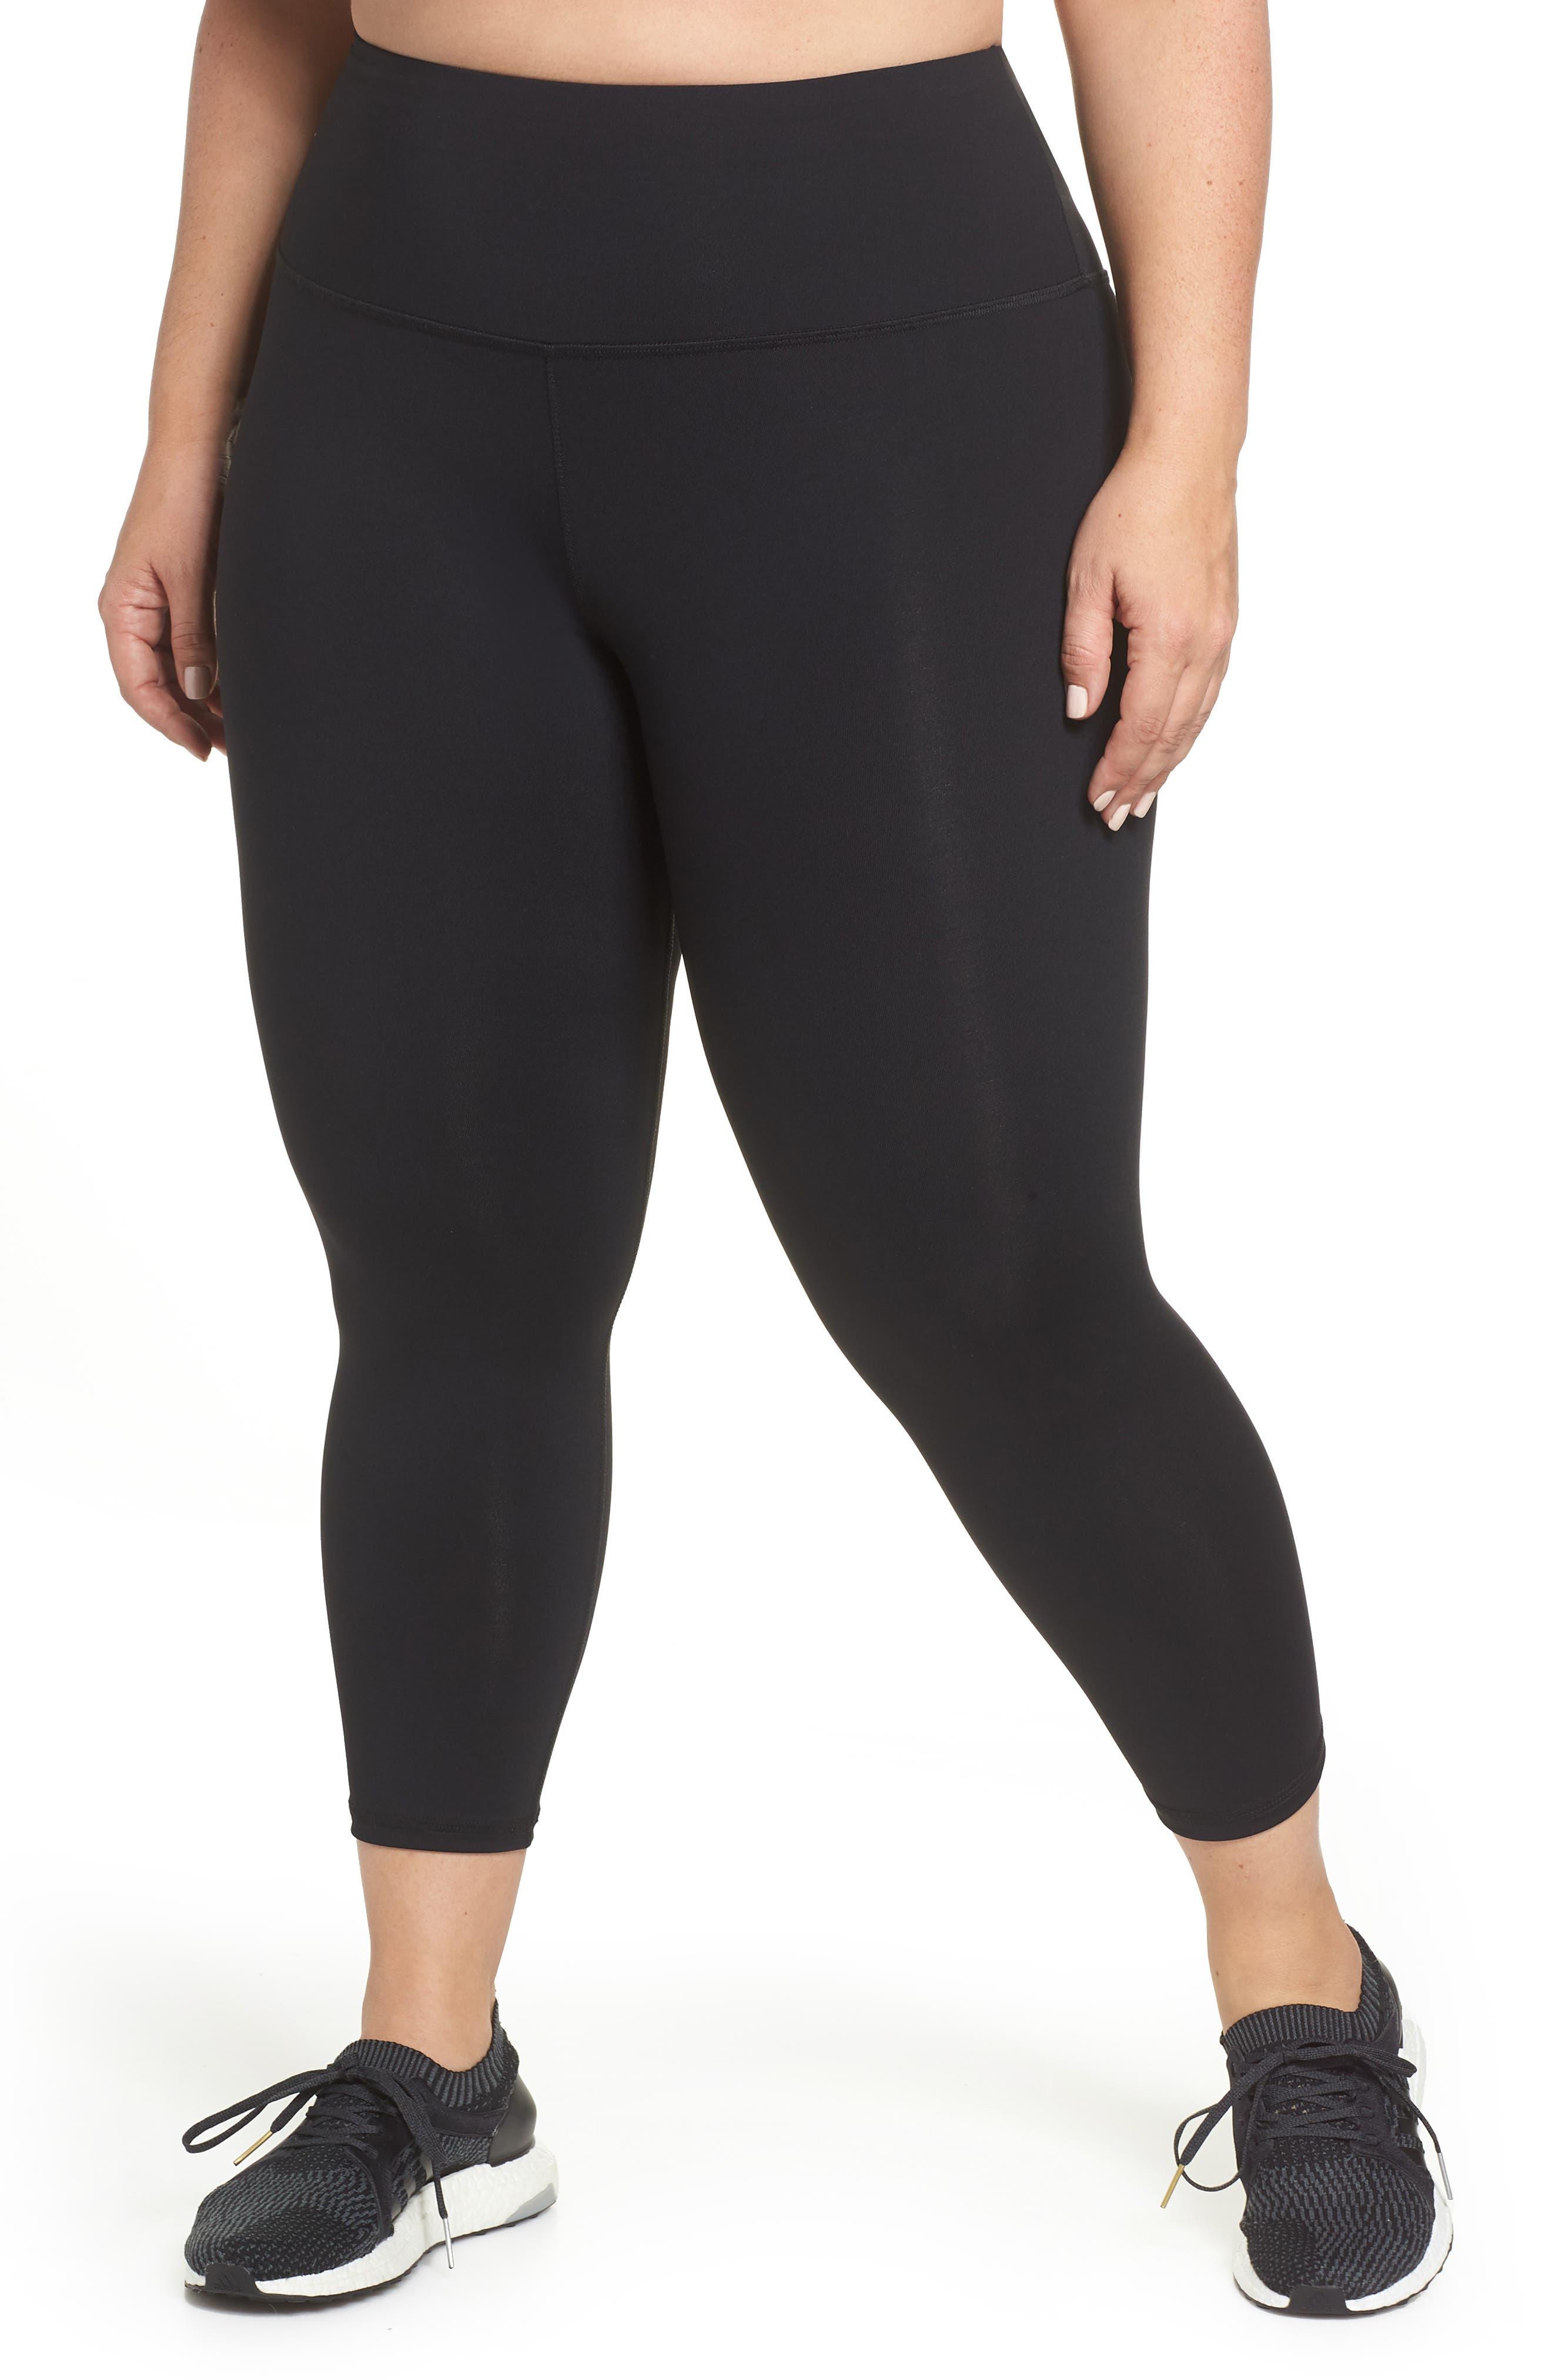 Plus Size Lola Getts Lola High Waist Skinny Capri Leggings, Black